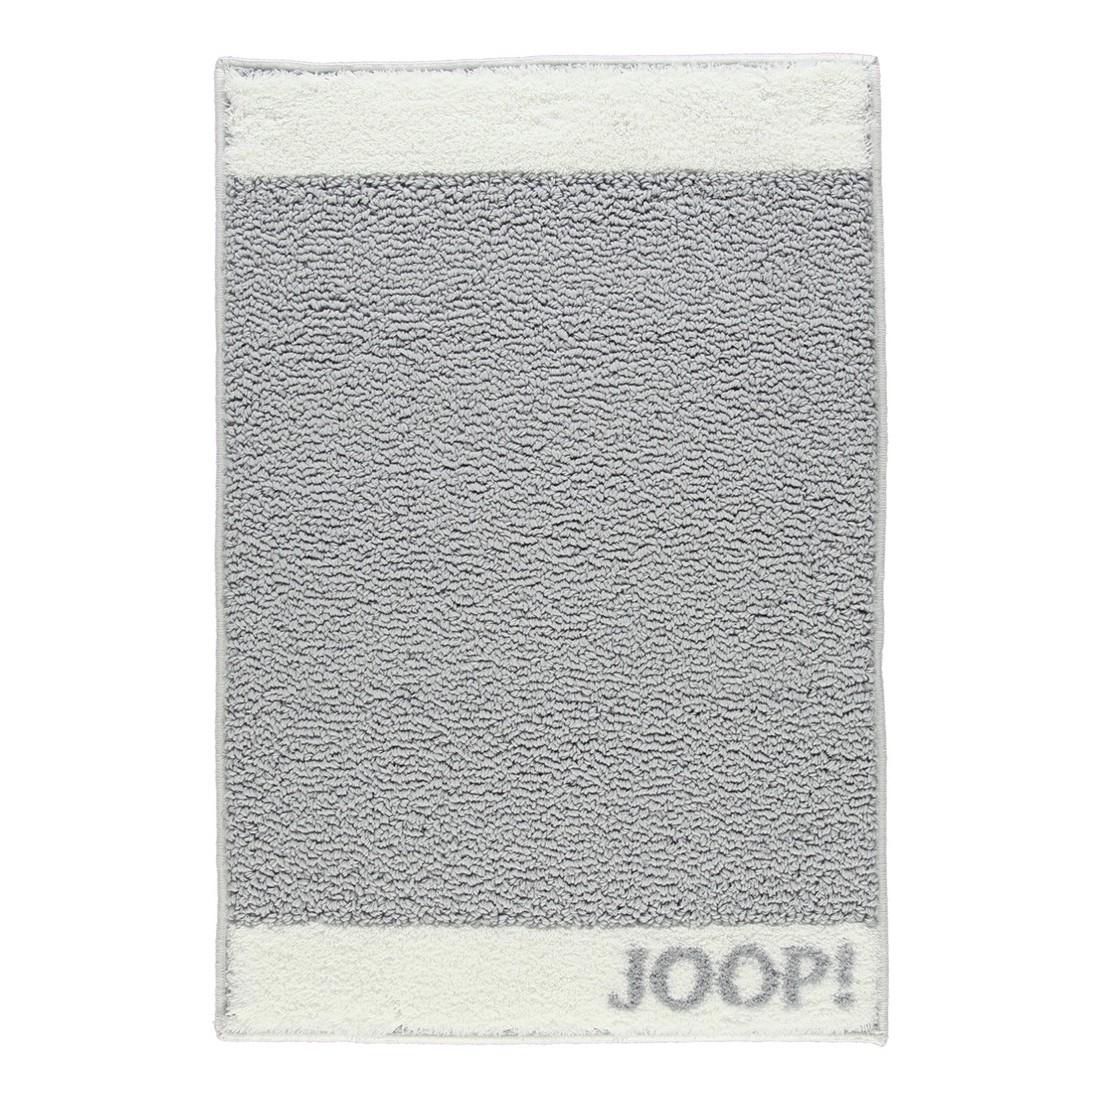 Badteppich Dialog – 100% Polyacryl Kiesel – 085 – 60 x 90 cm, Joop bestellen